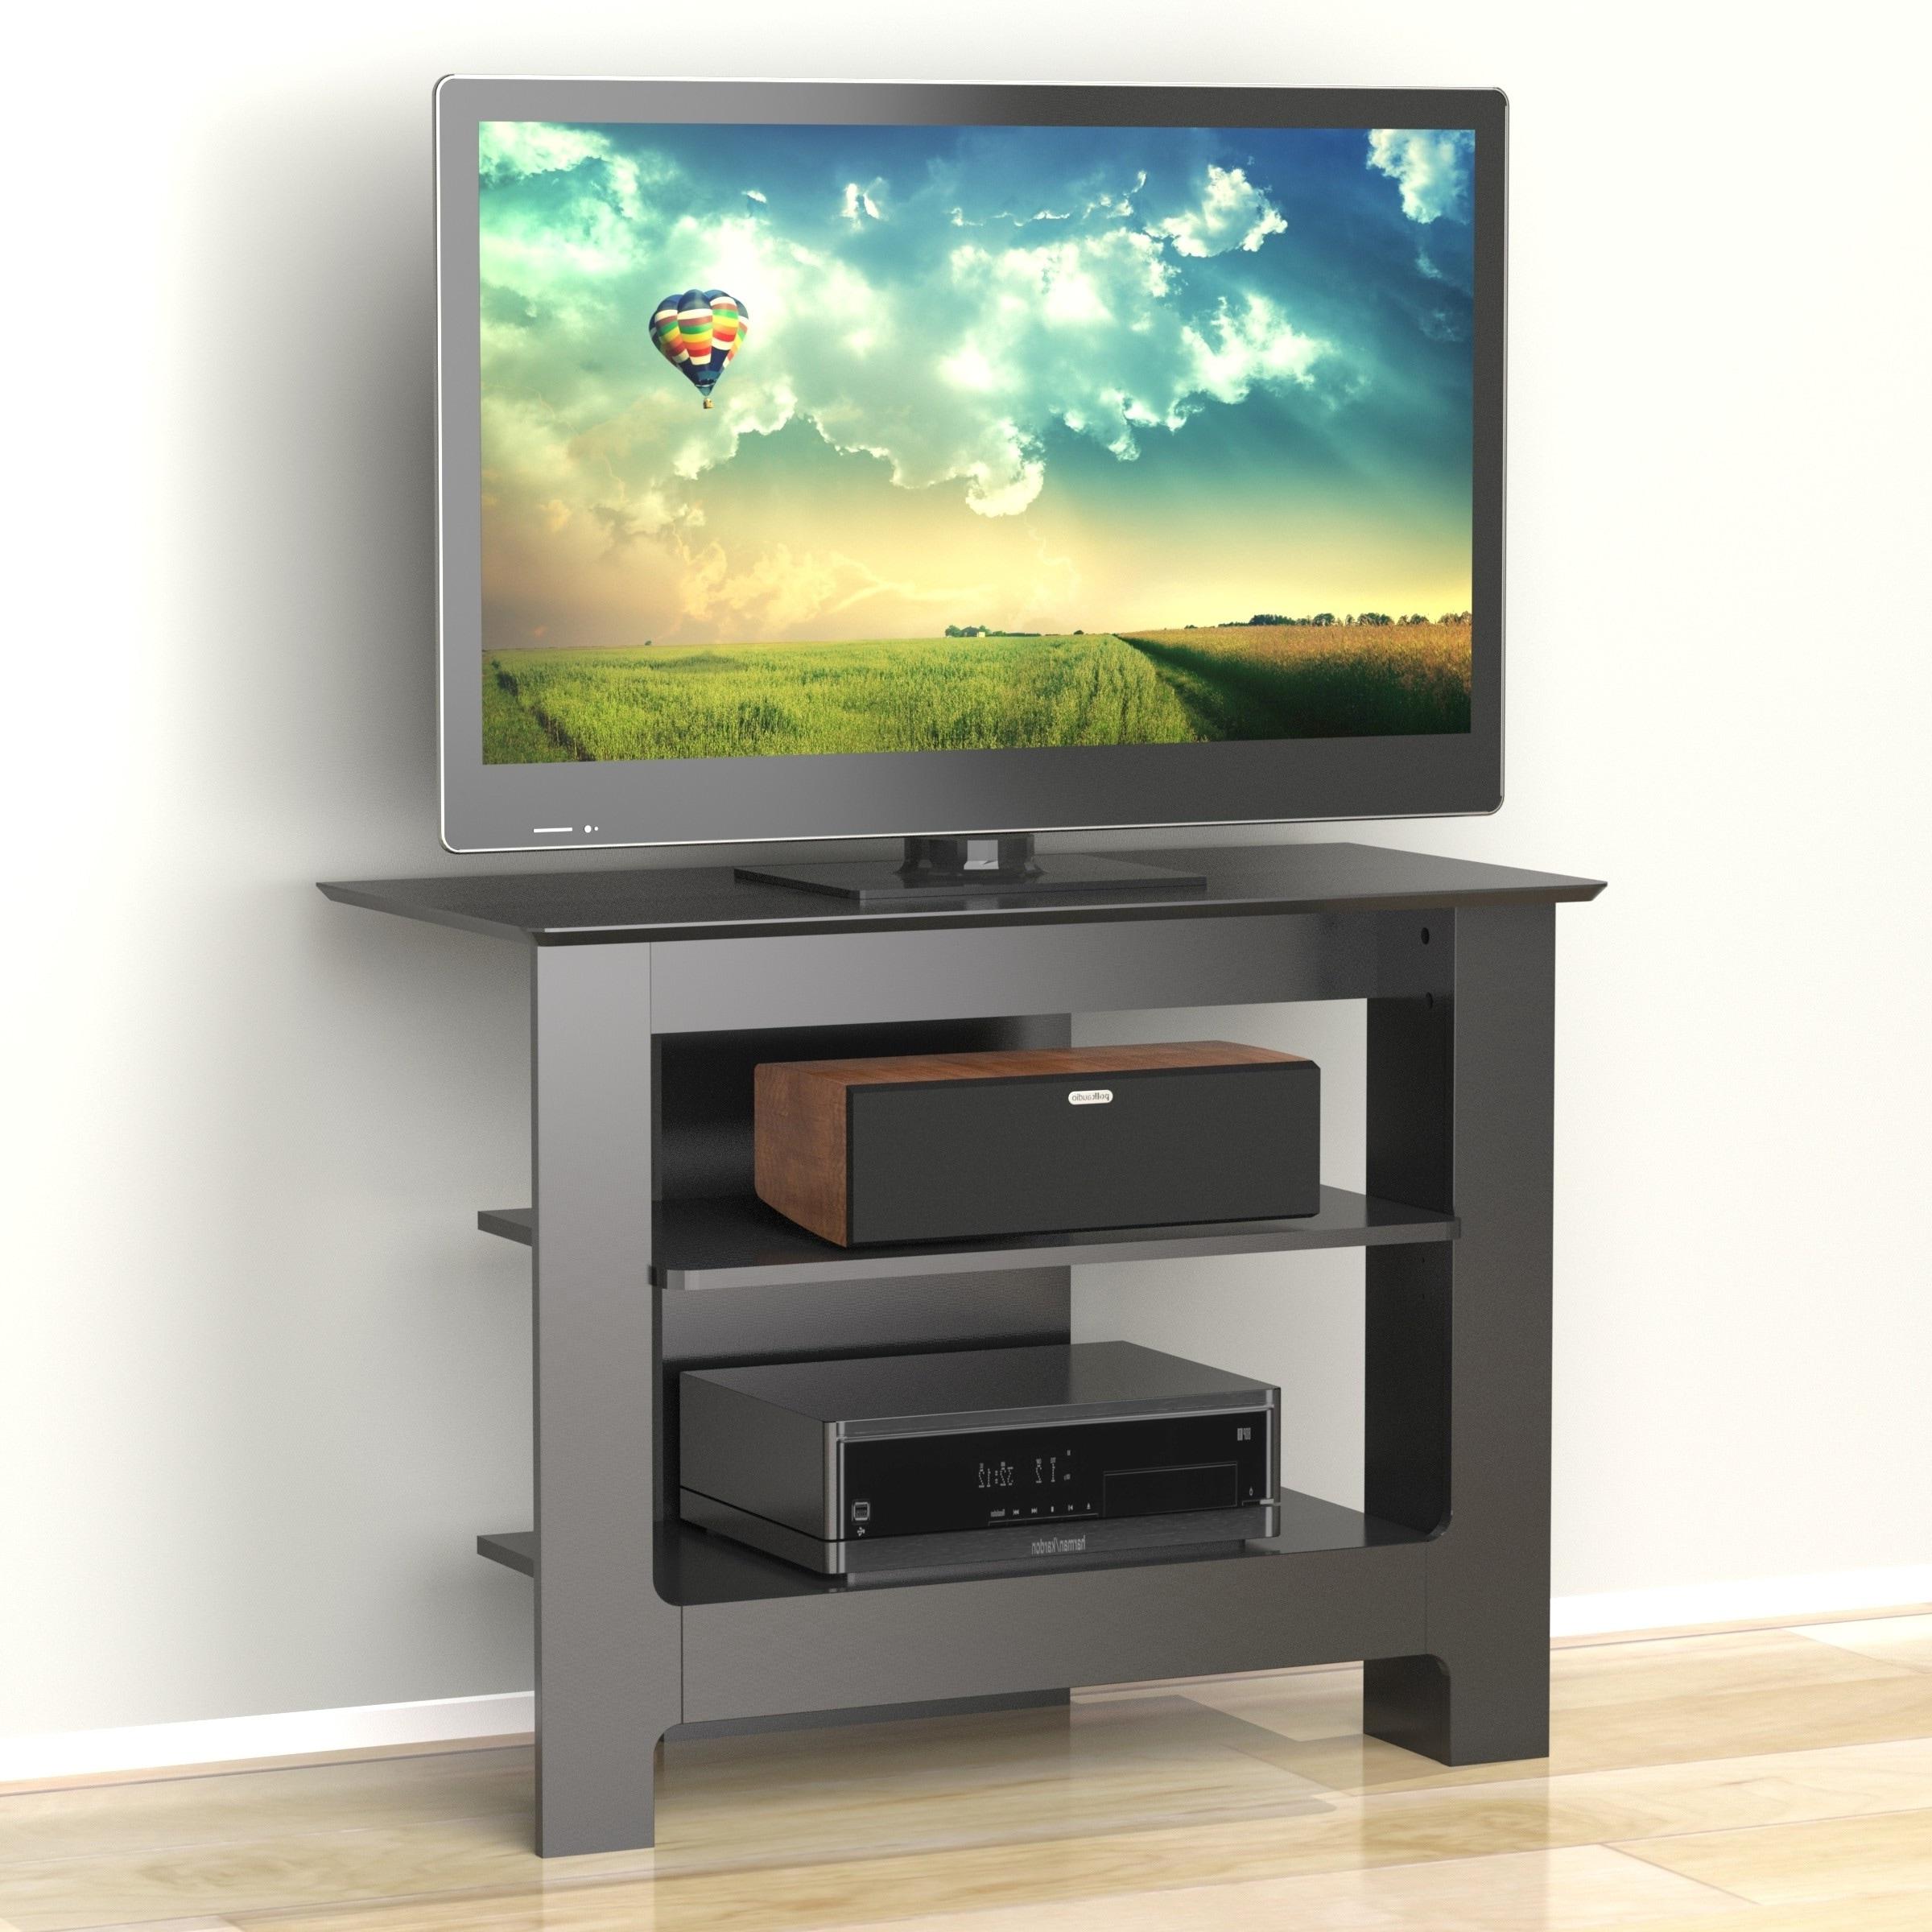 Nexera Pinnacle 31 Inch Tall Boy Tv Stand, Black Black (View 6 of 25)